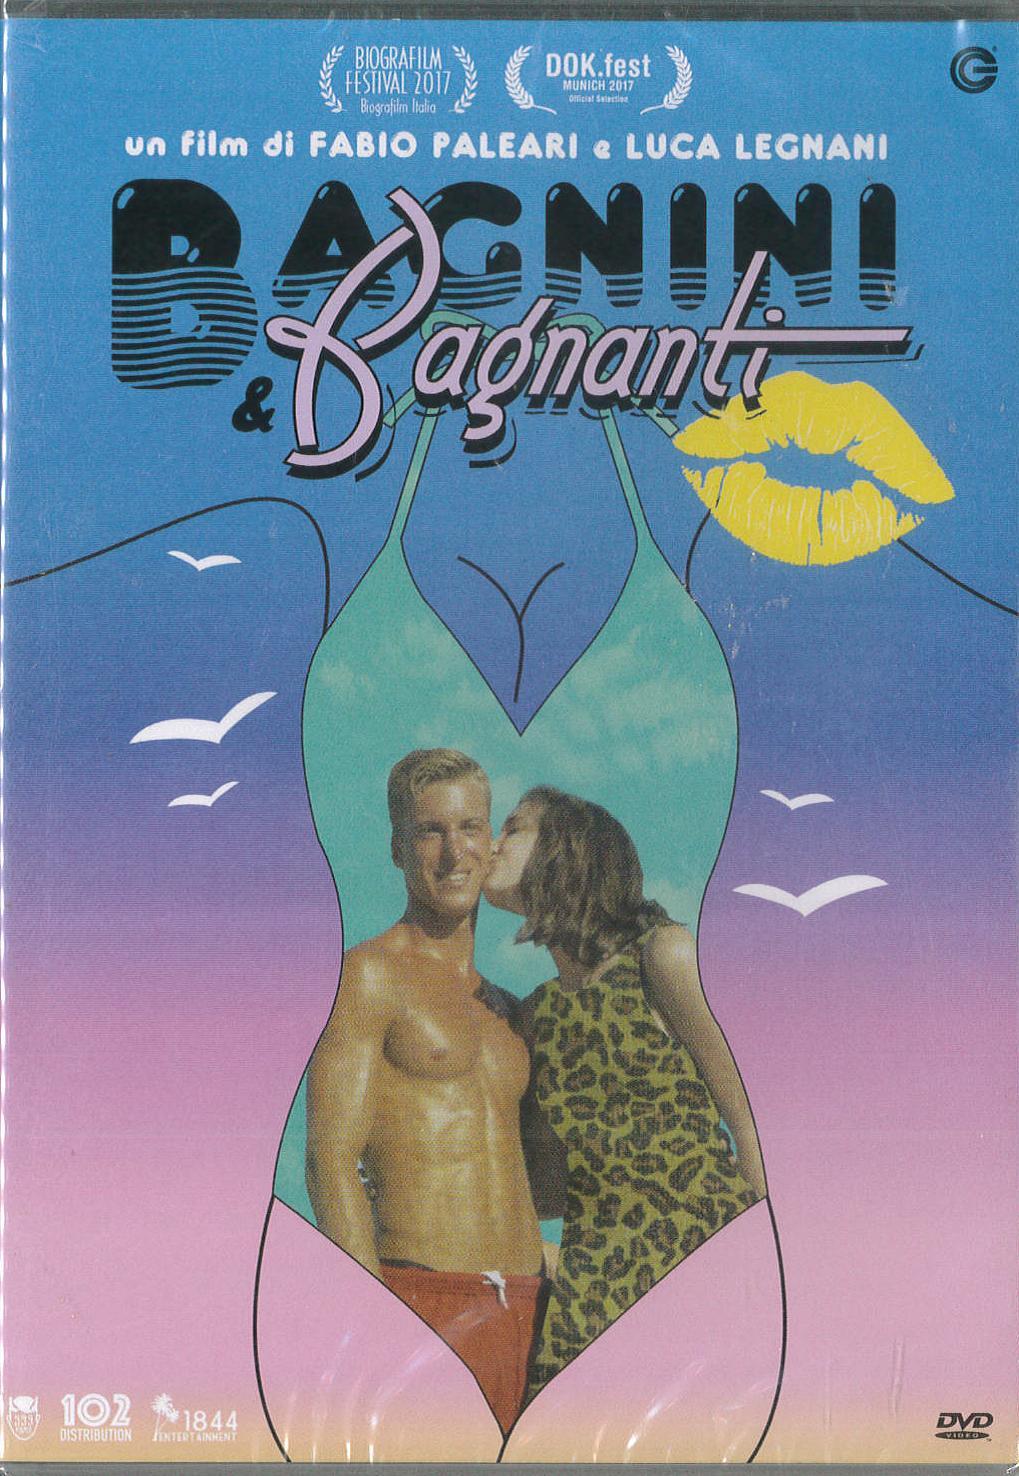 BAGNINI E BAGNANTI (DVD)